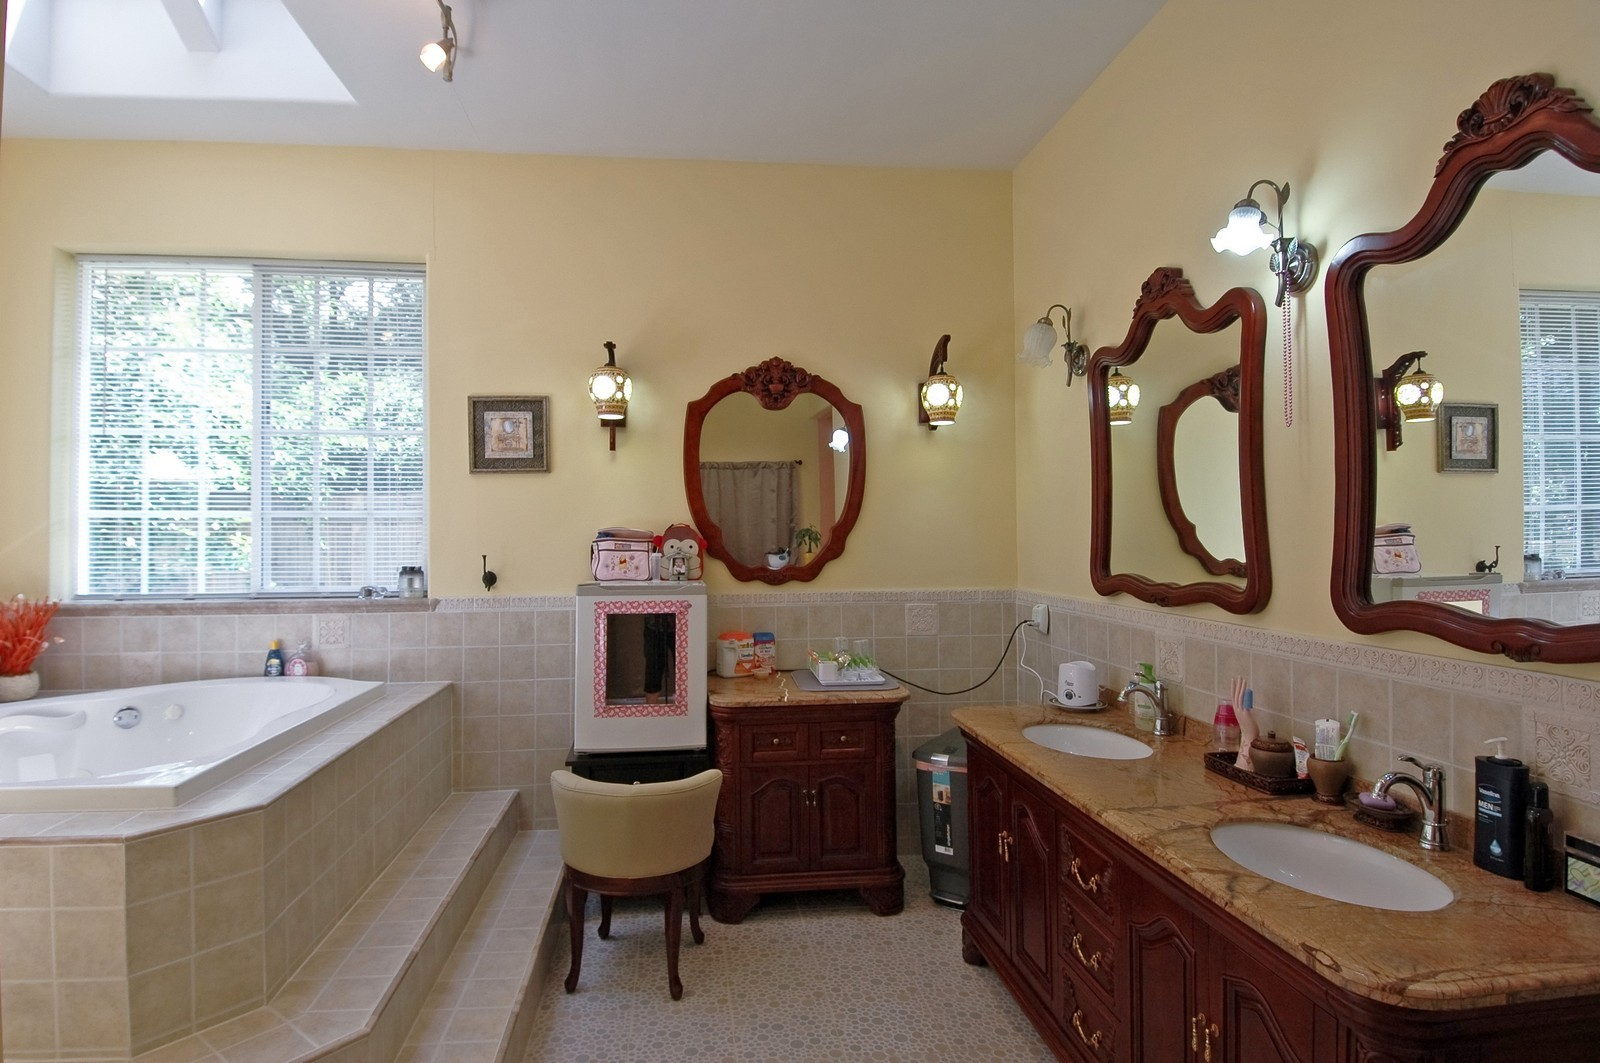 Real Estate Photography - 10N875 Belmont St, Elgin, IL, 60120 - Master Bathroom